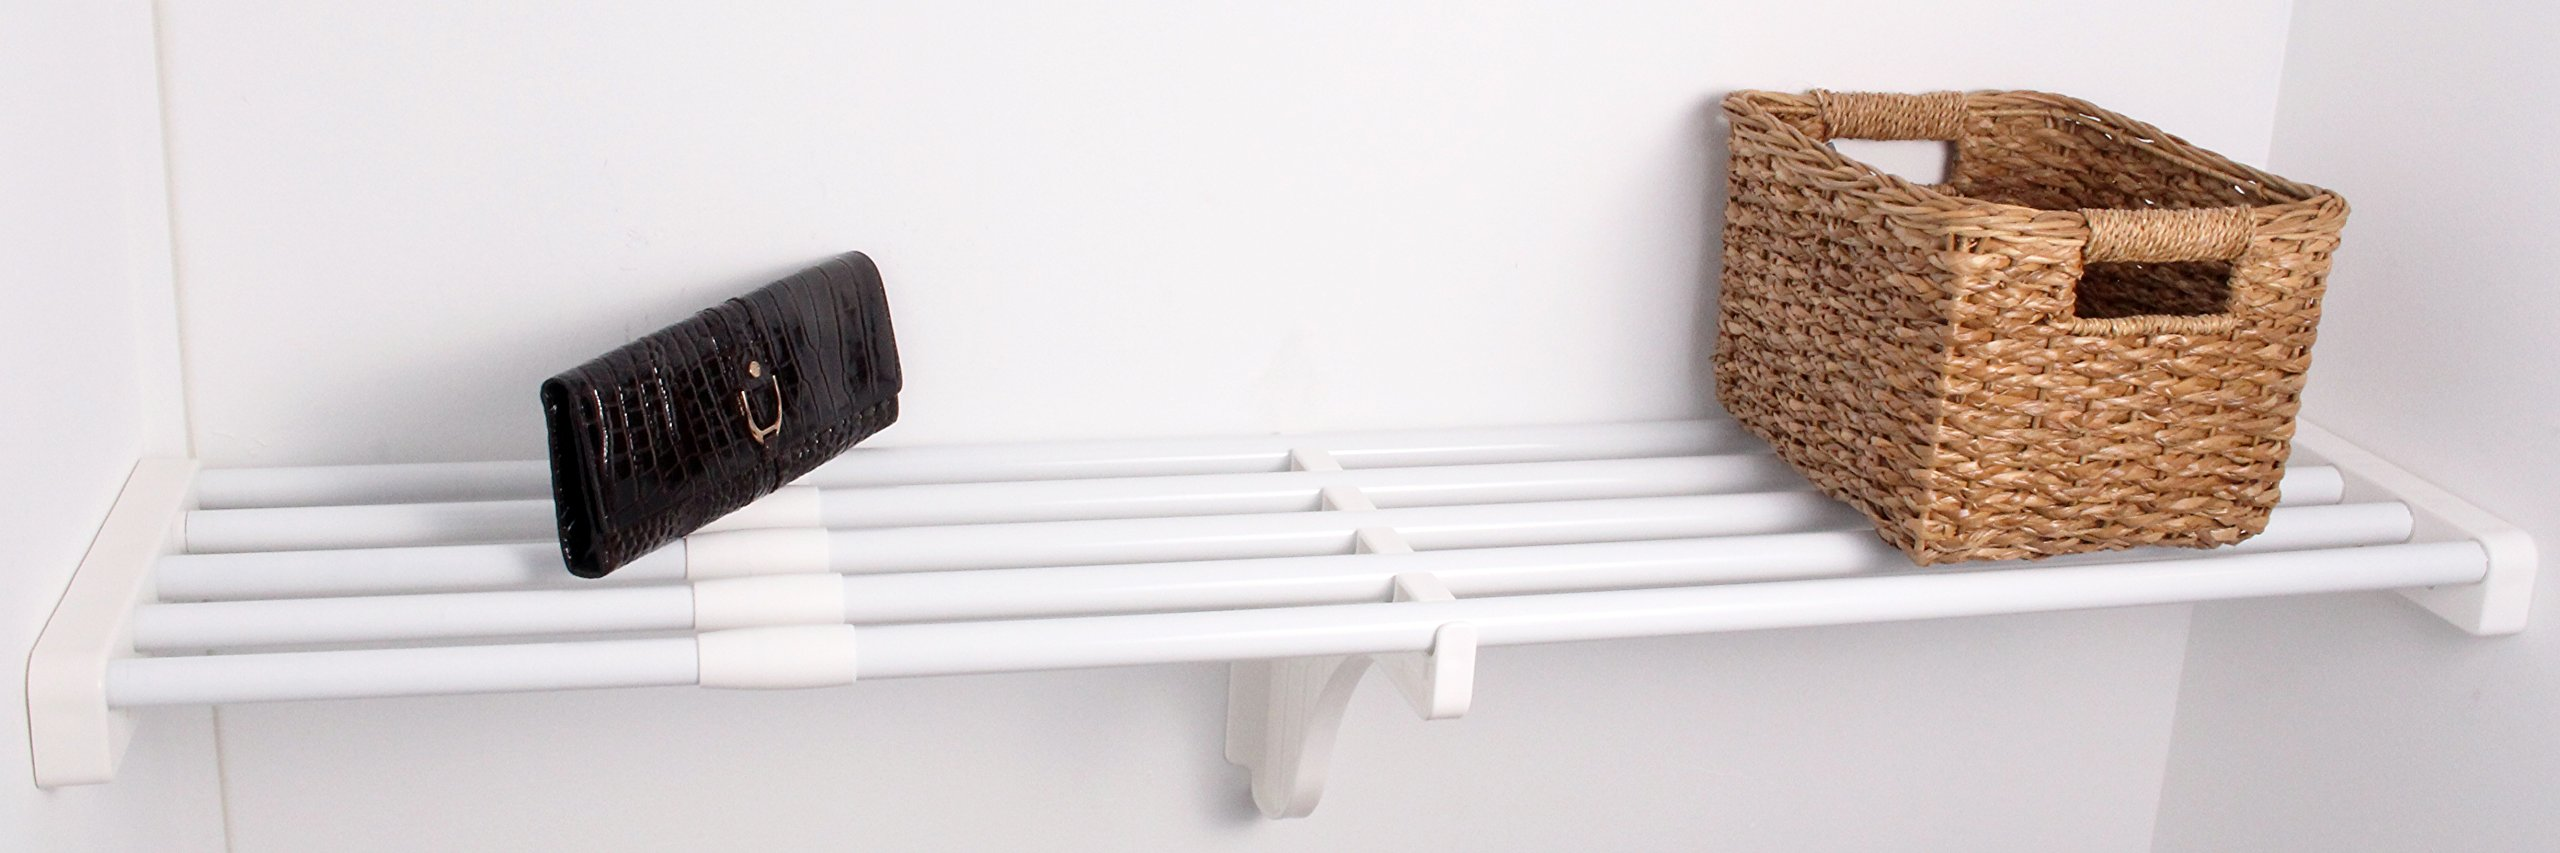 EZ Shelf - 40'' - 73'' Expandable Shelf - White - No Brackets - For Mounting Between Two Sidewalls